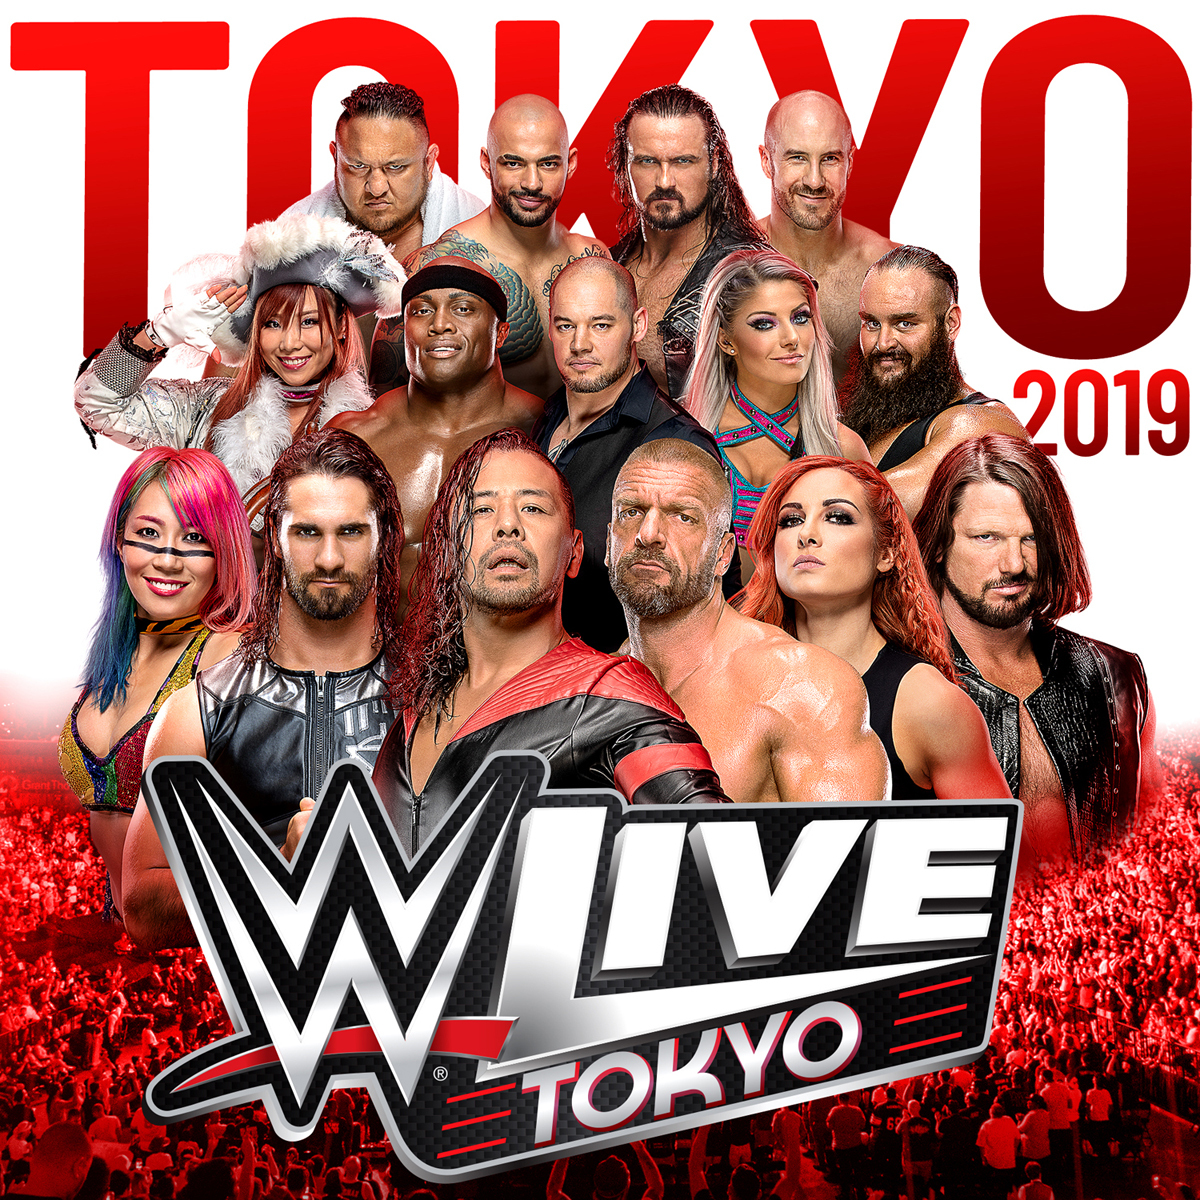 WWE日本公演『WWE Live Tokyo』は6月28日(金)開幕